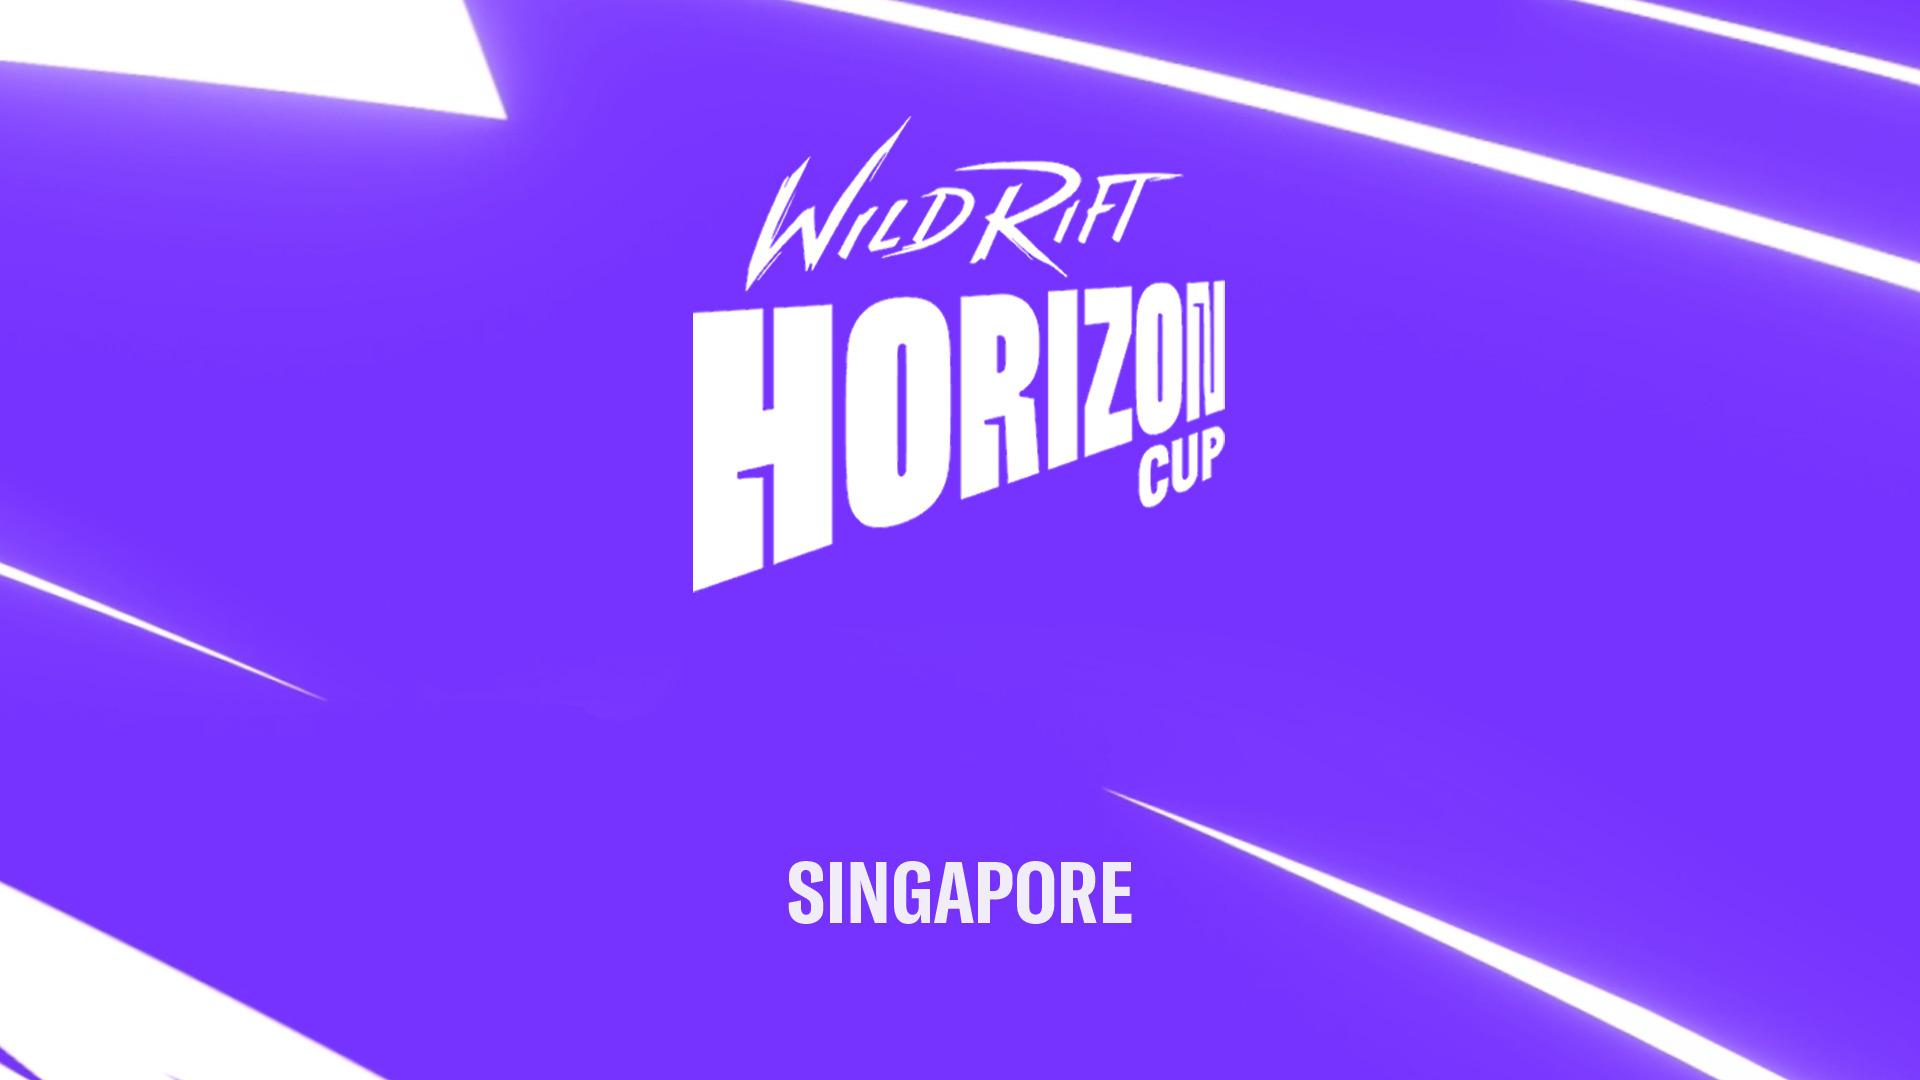 Presentamos la Wild Rift: Horizon Cup